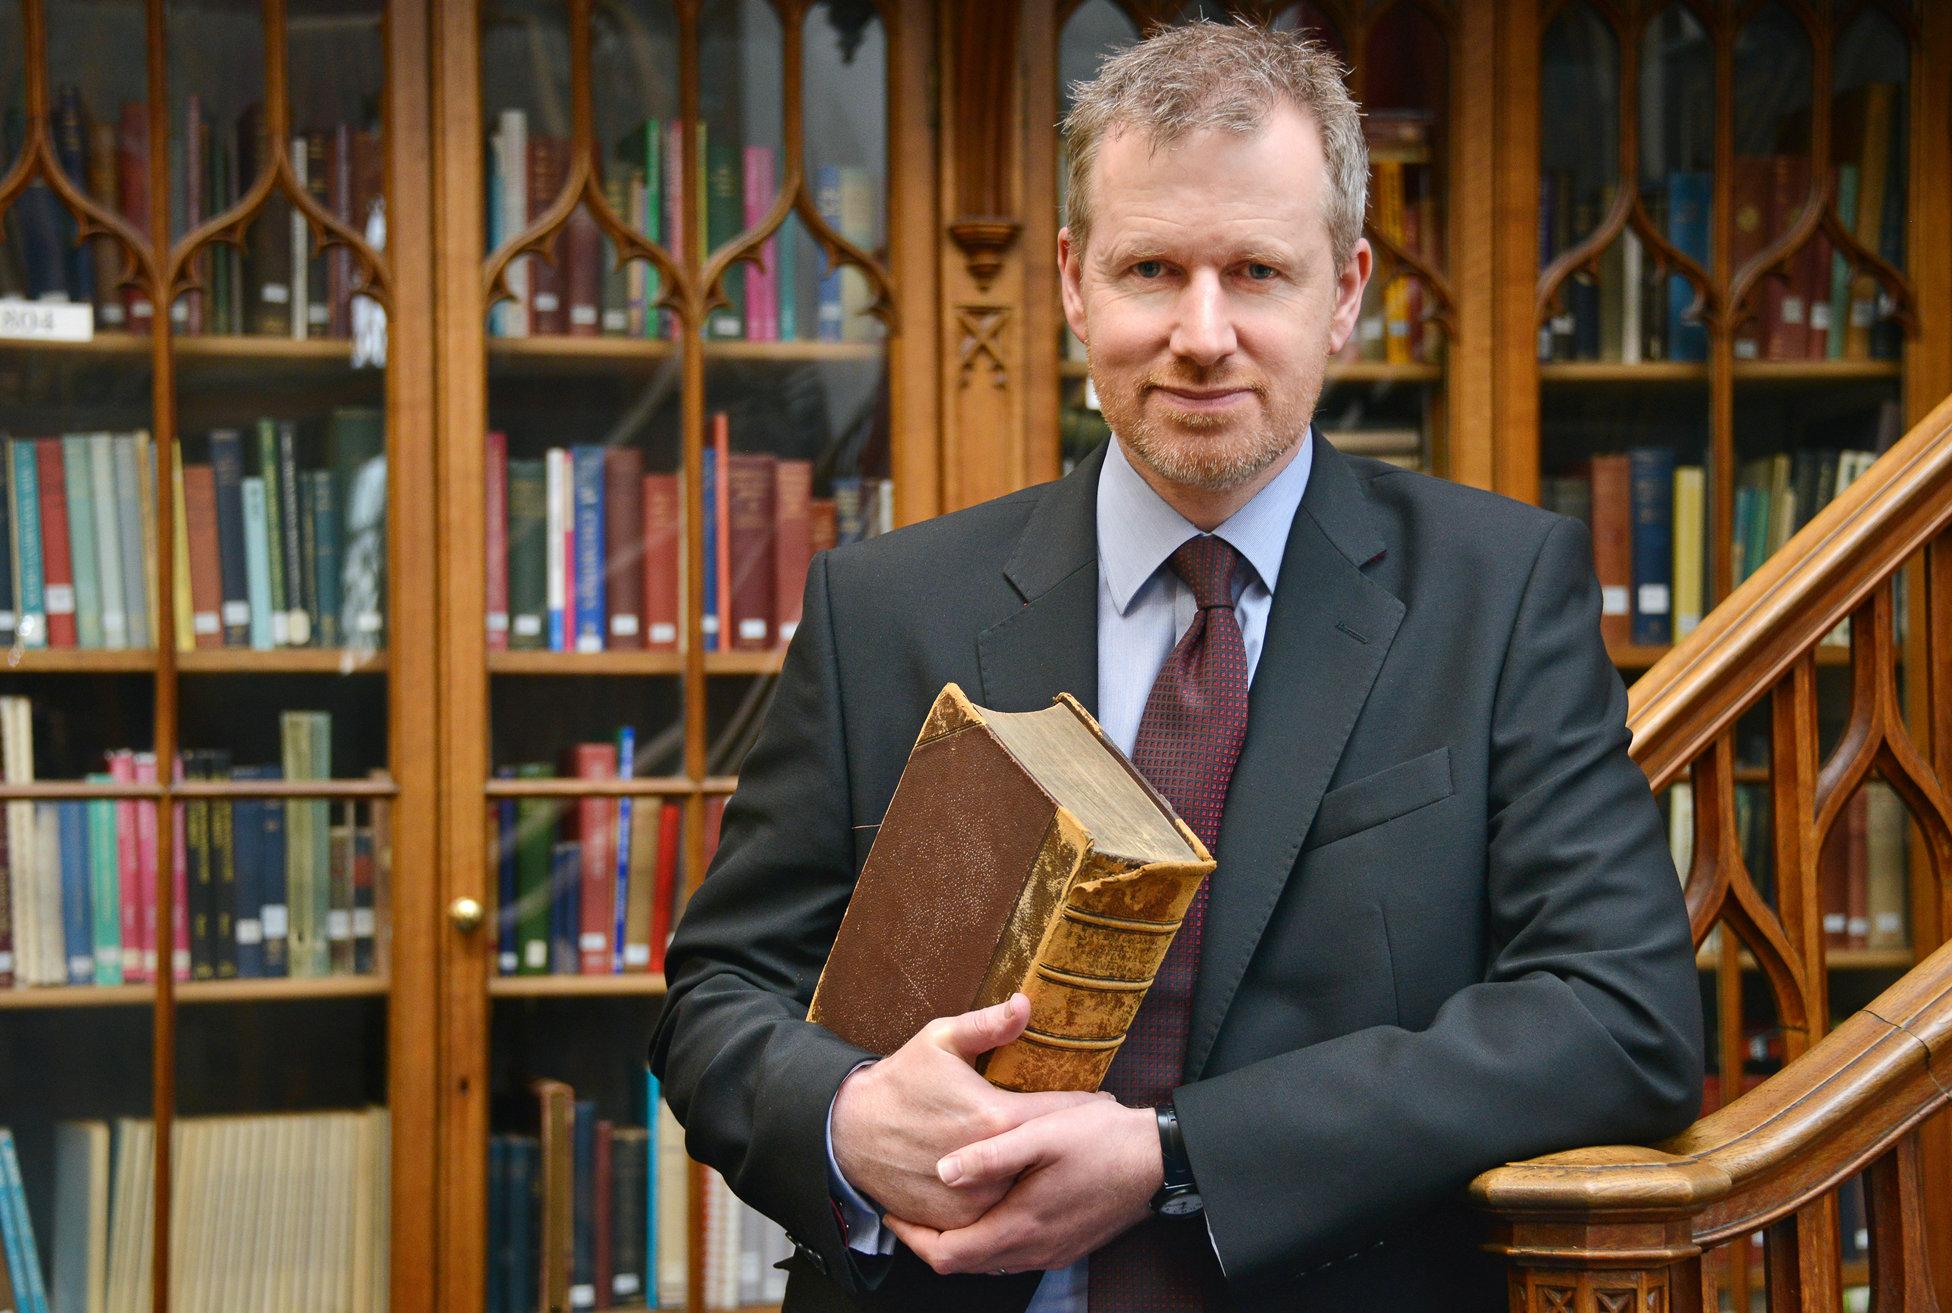 Aberdeen University professor John Paterson